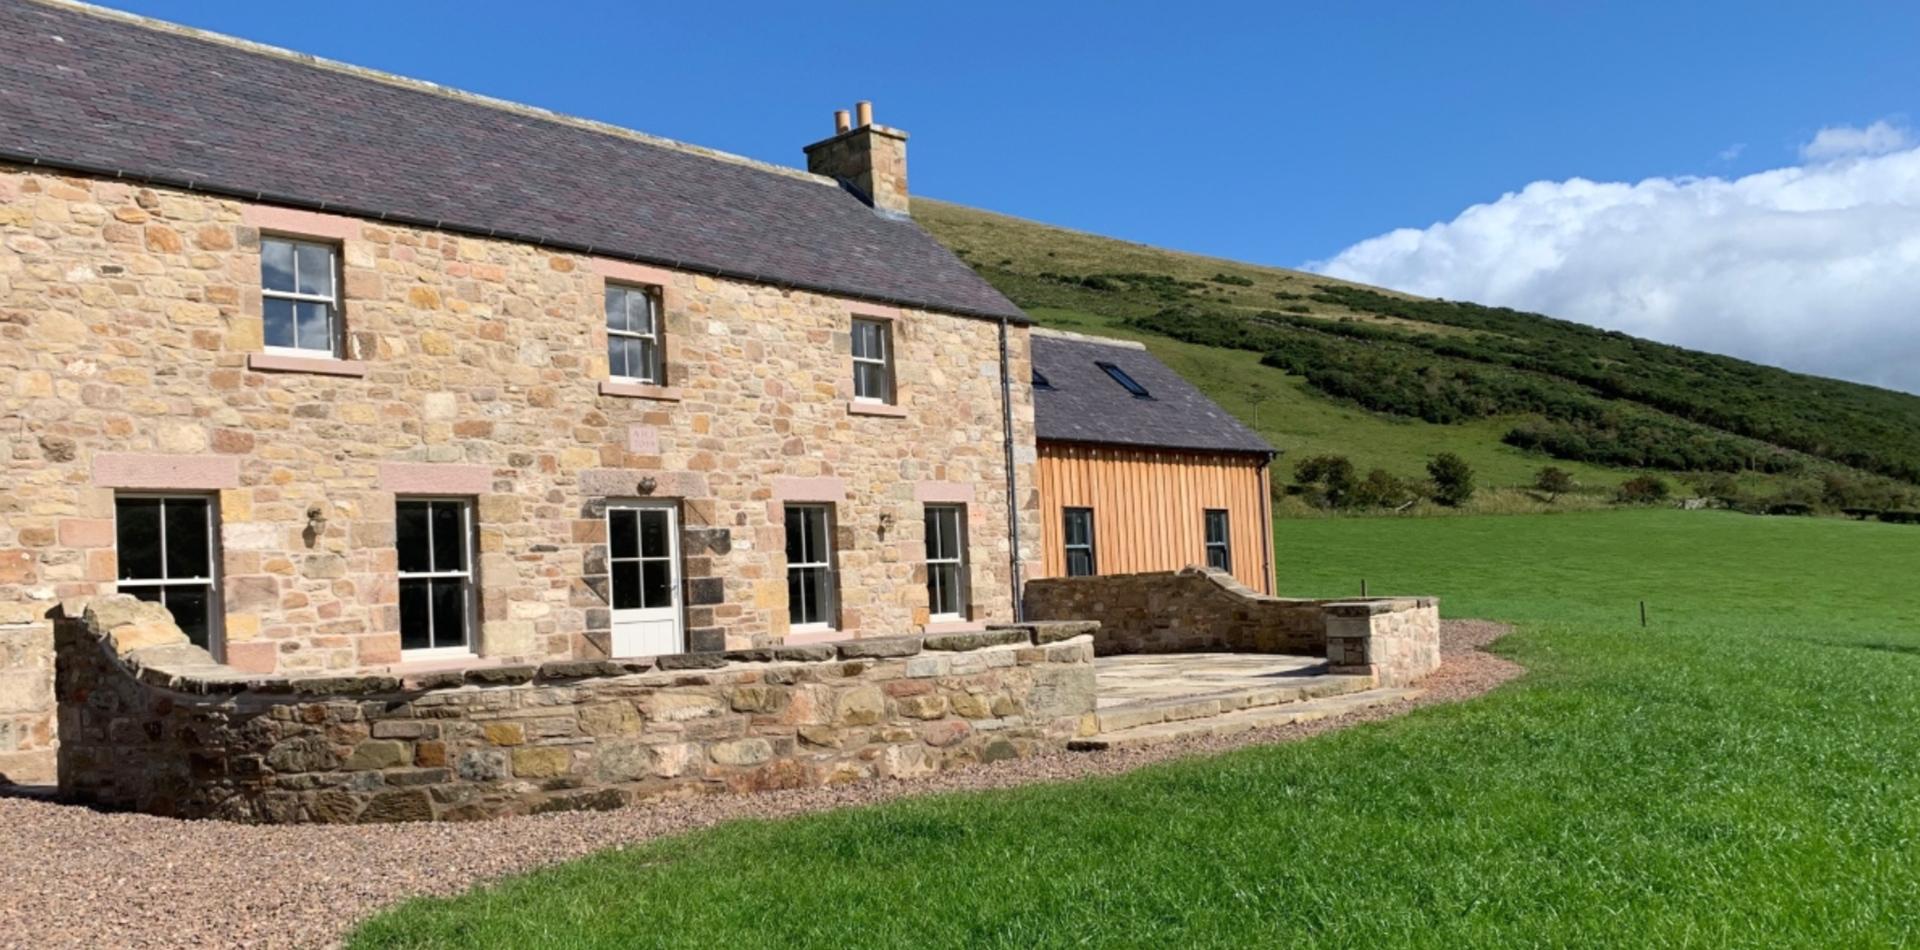 Wild-Plum-Holiday Cottages-Housedon Haugh